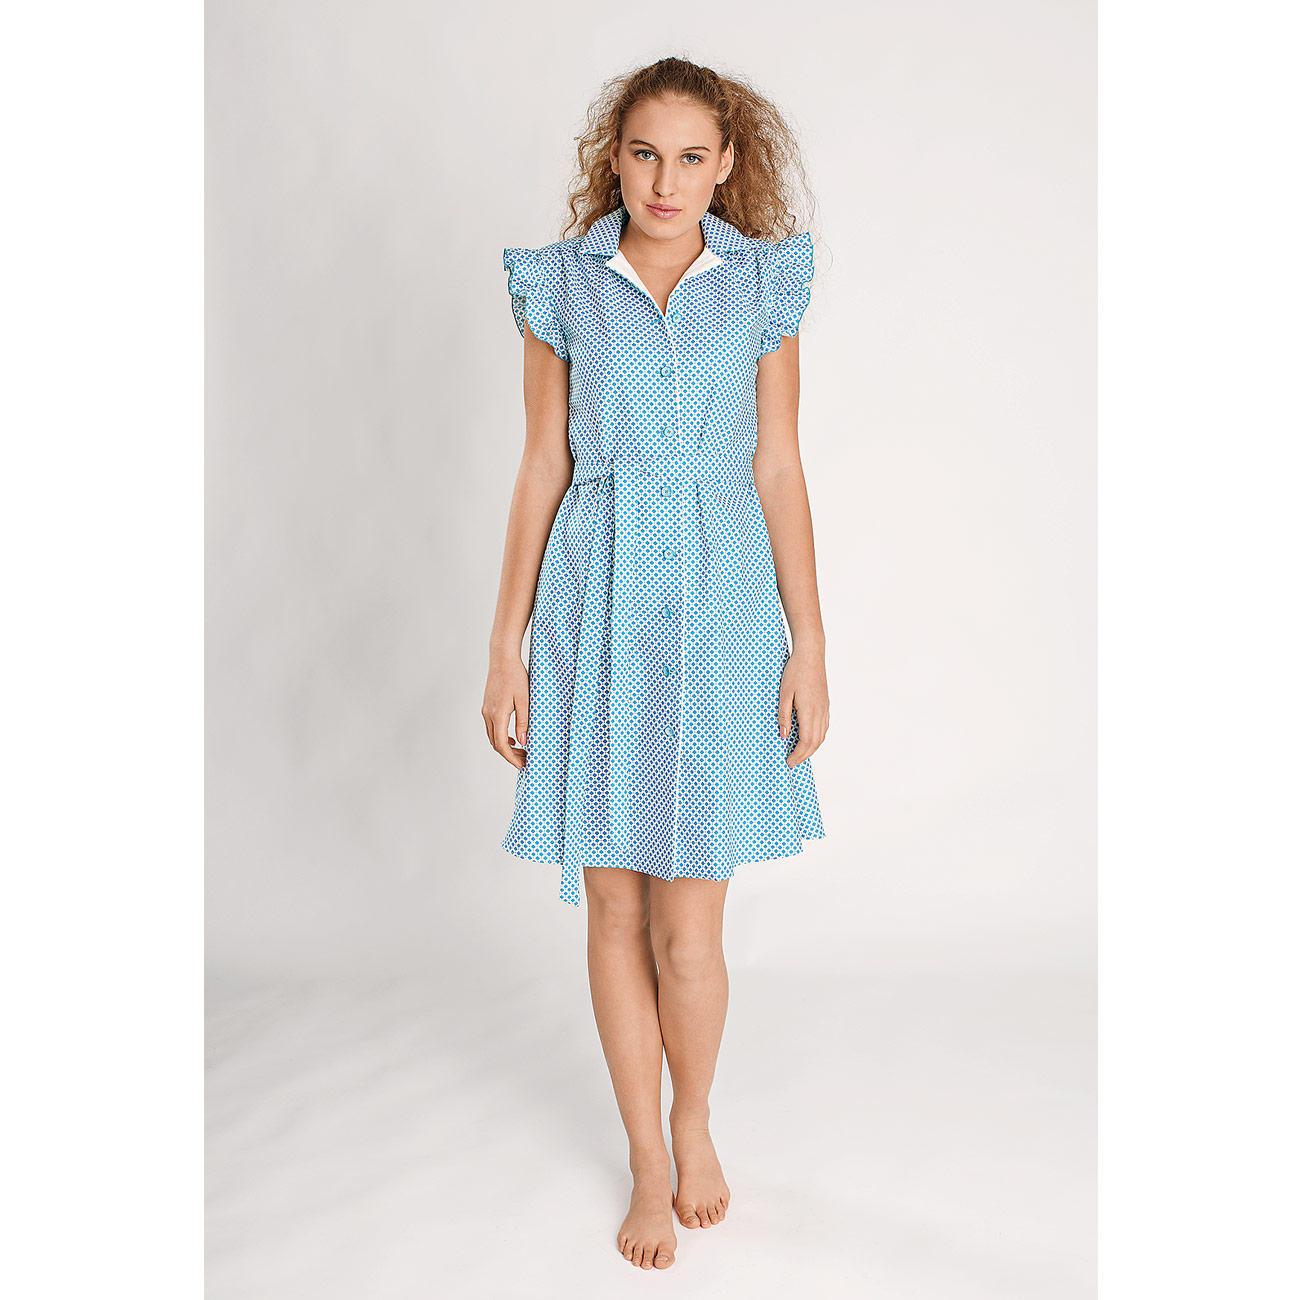 Schnittmuster - Kleid & Bluse Franzi